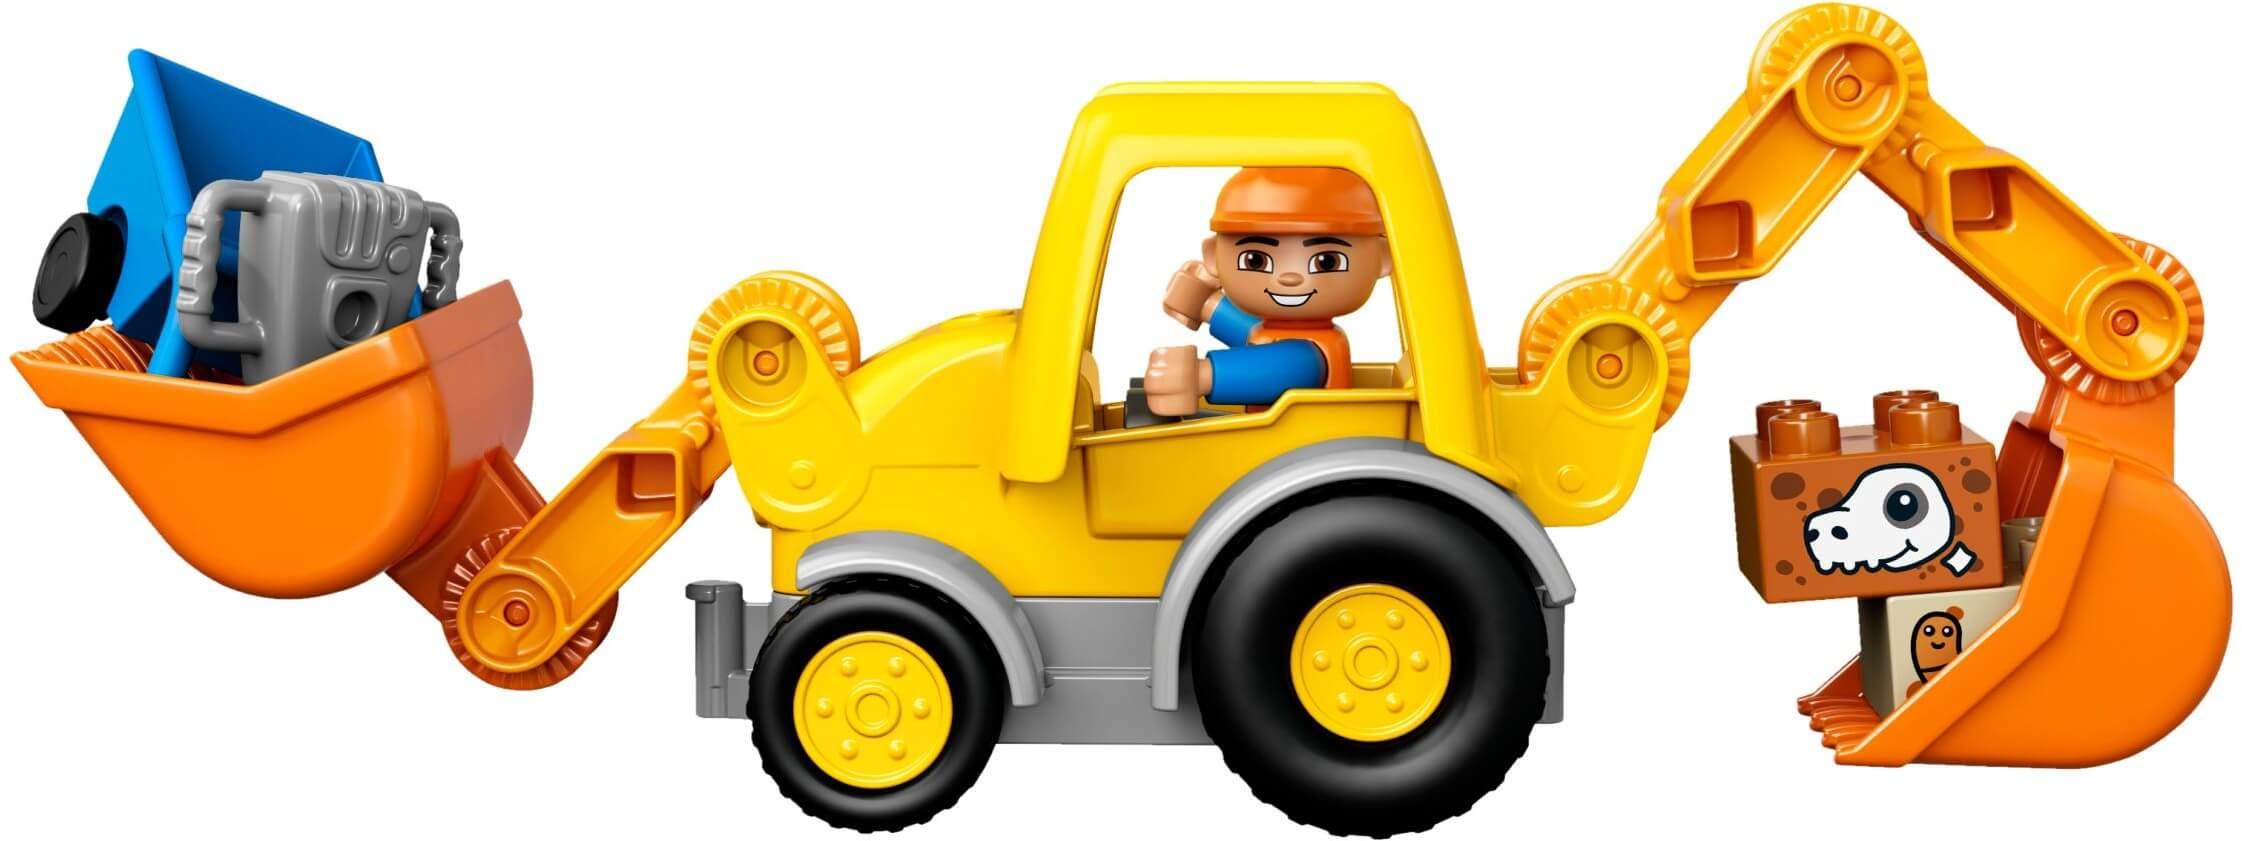 Mua đồ chơi LEGO 10811 - LEGO DUPLO 10811 - Xe Ủi của Bé (LEGO DUPLO Backhoe Loader 10811)